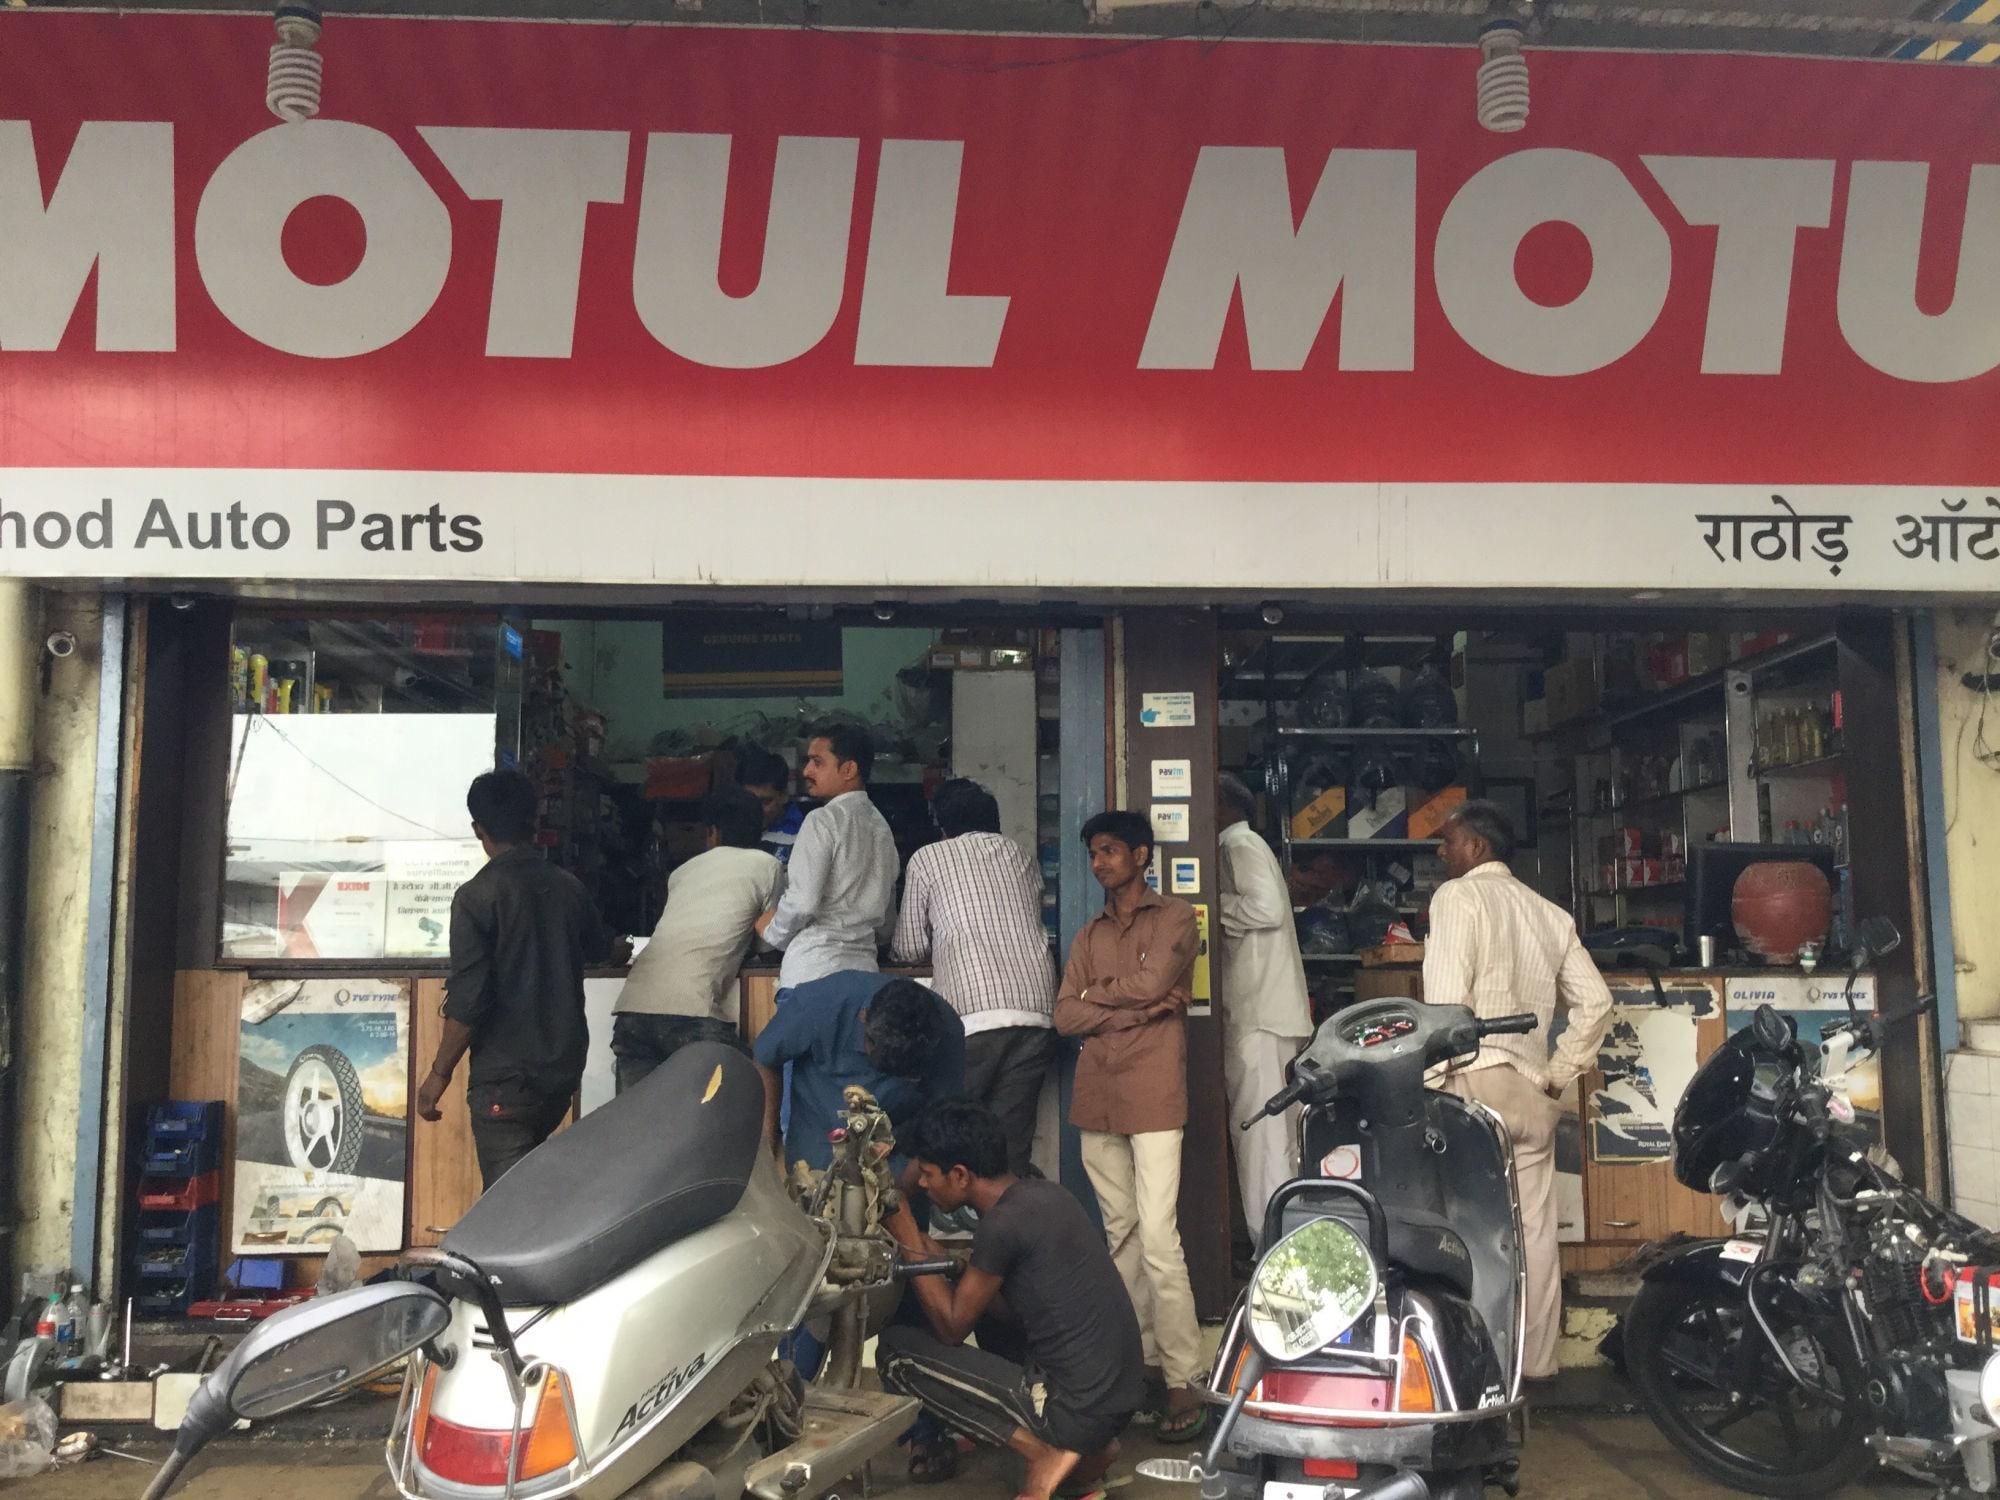 Top Yezdi Motorcycle Part Dealers in Pune - Best Yezdi Motorcycle